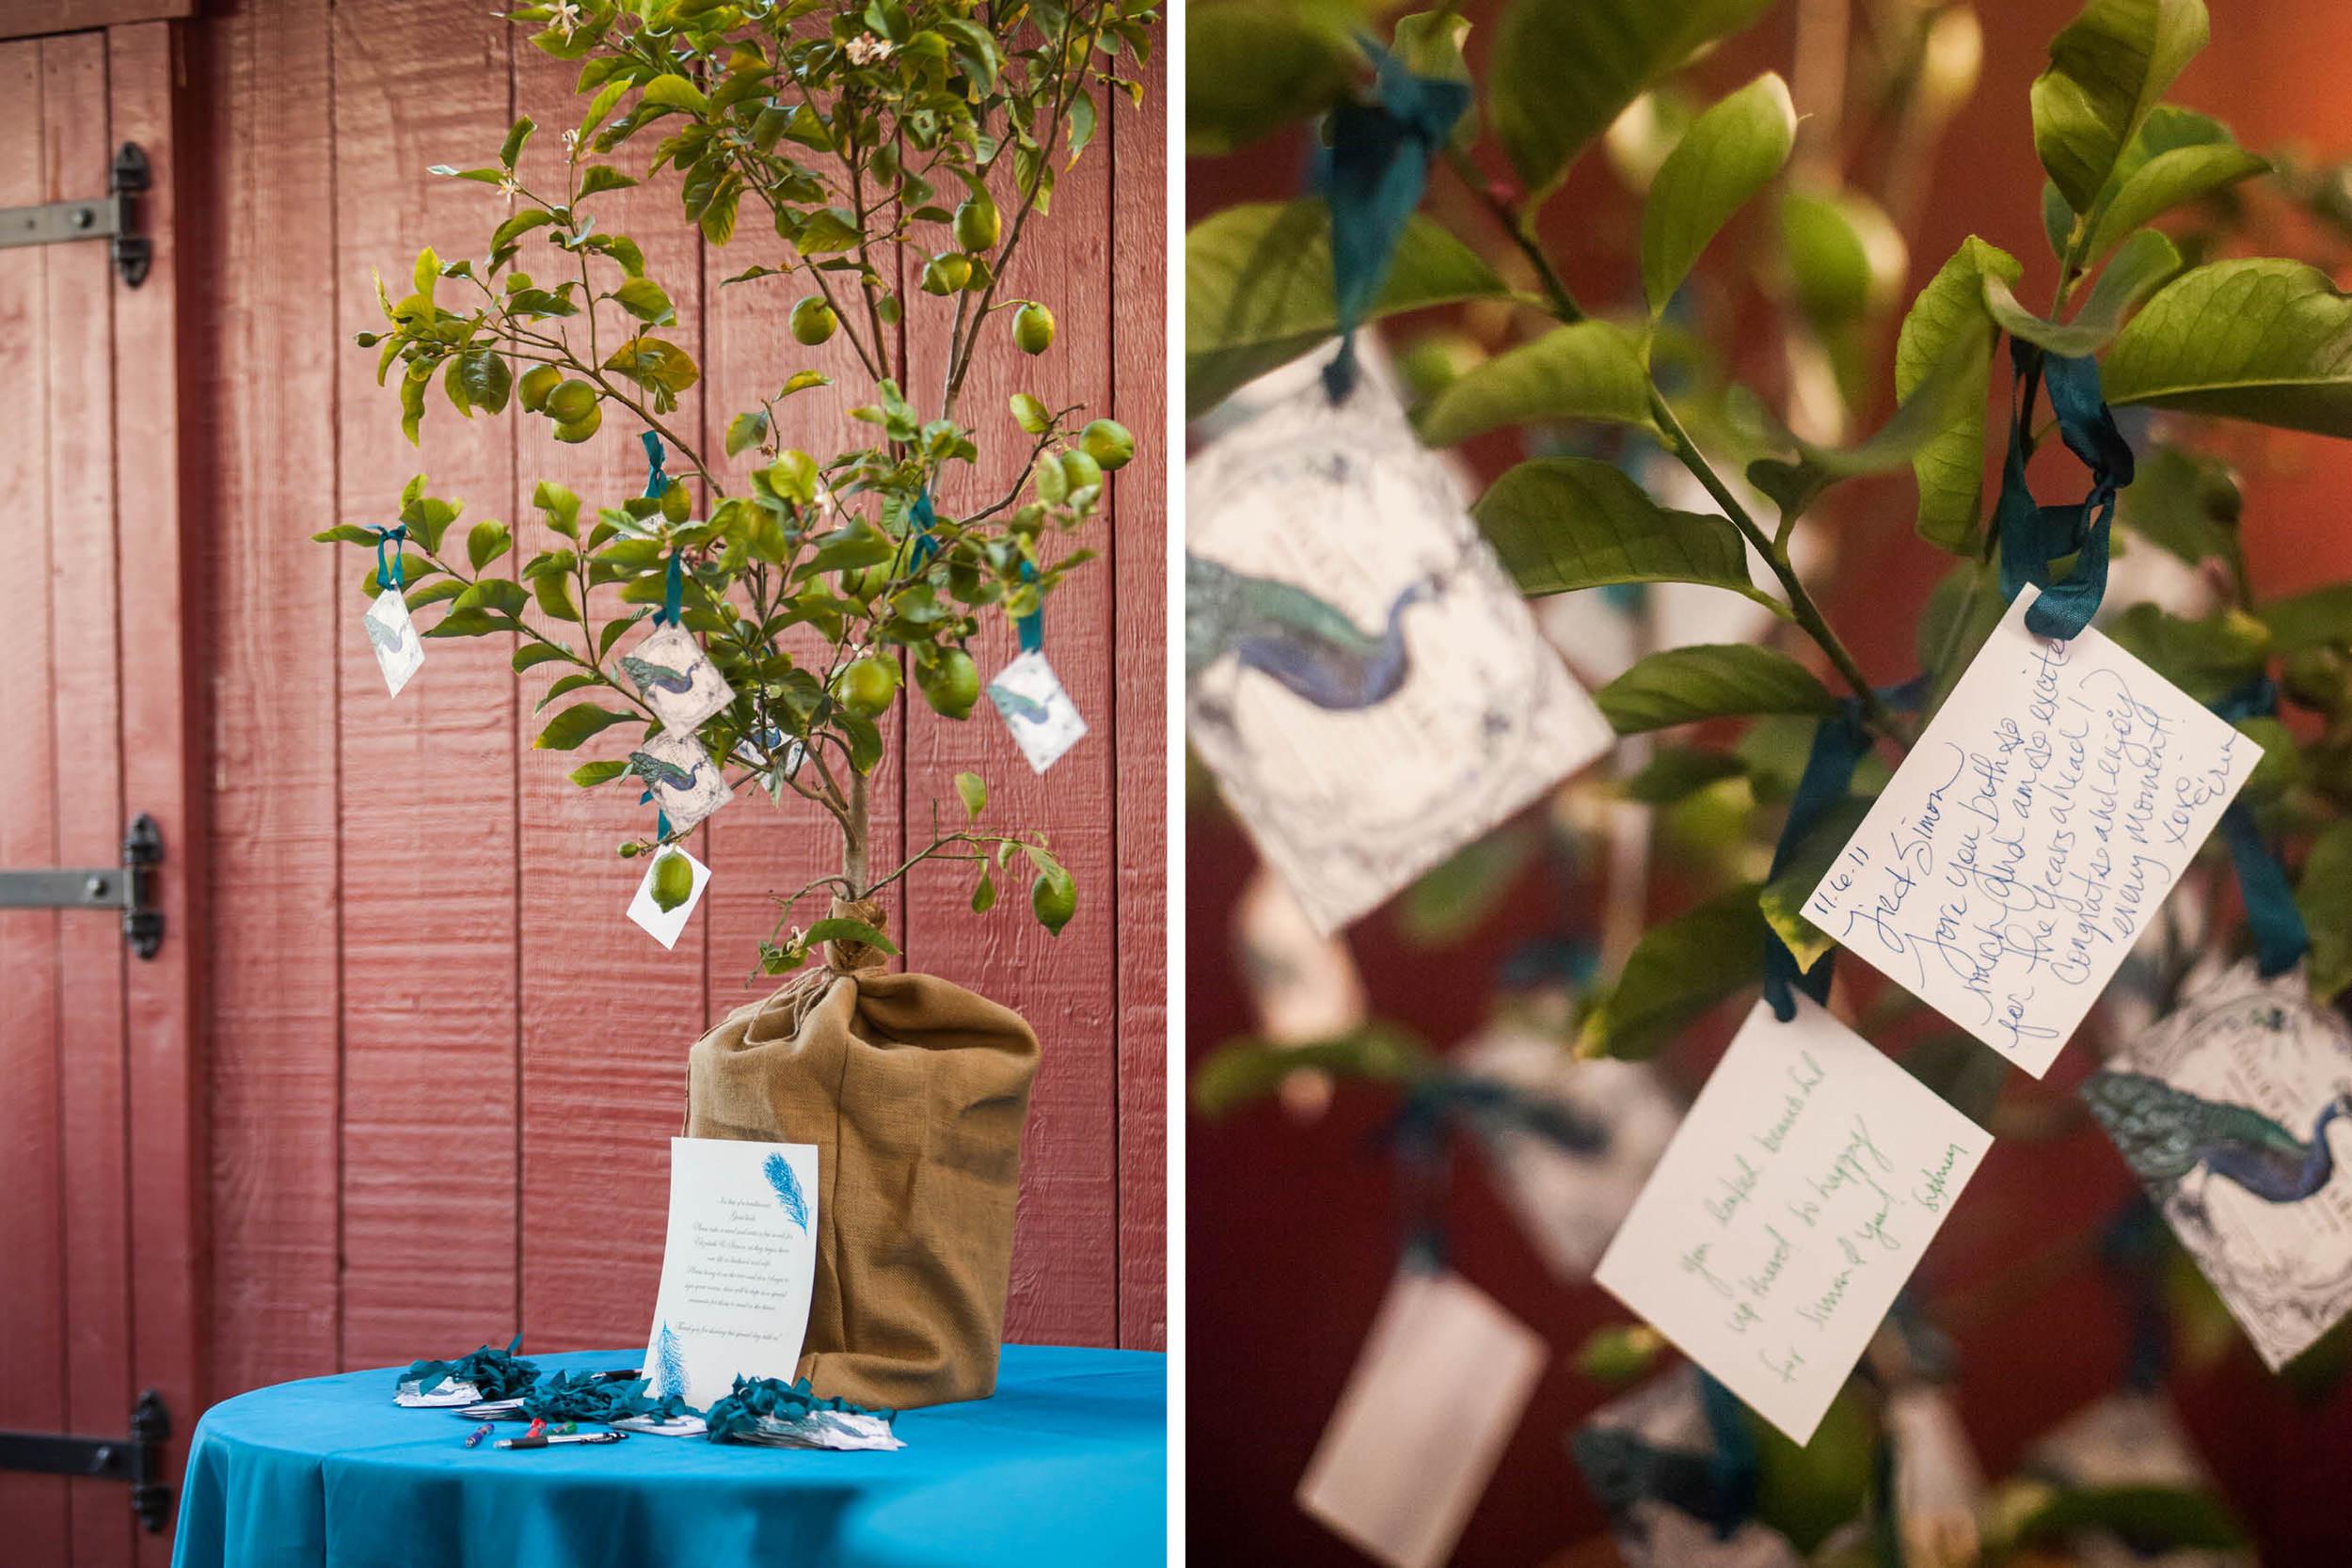 tres-hermanas-winery-vineyard-wedding-planner-coordinator-santa-barbara-ynez-maria (14).jpg